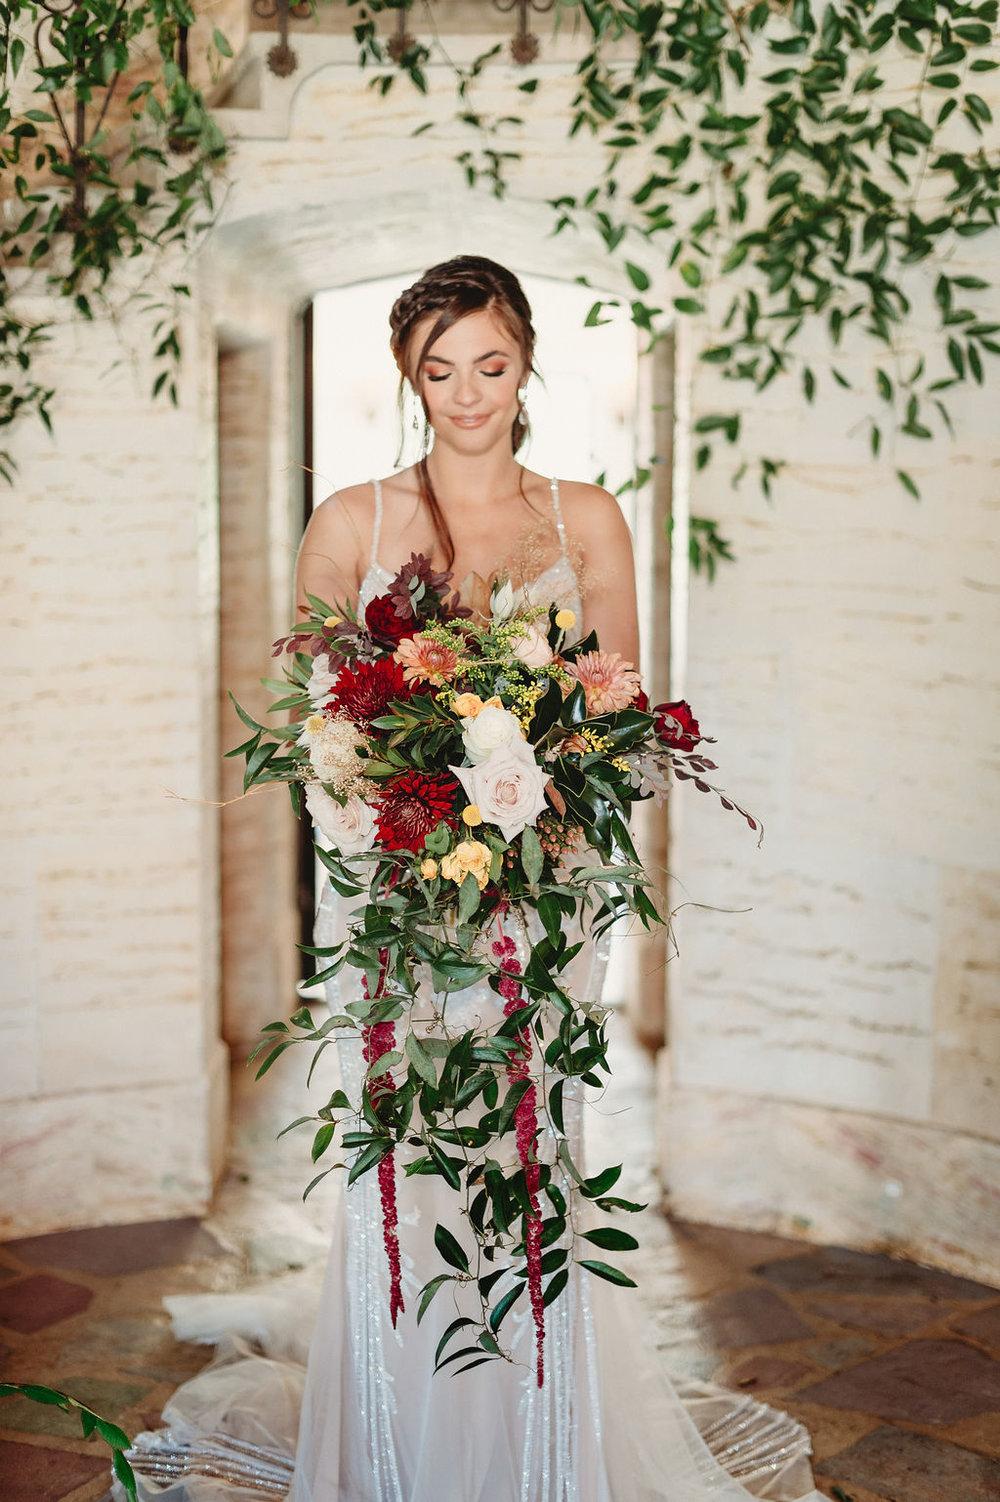 Dewitt-for-Love-Photography-Howey-Mansion-Photos-Wedding-Photographer-51.jpg